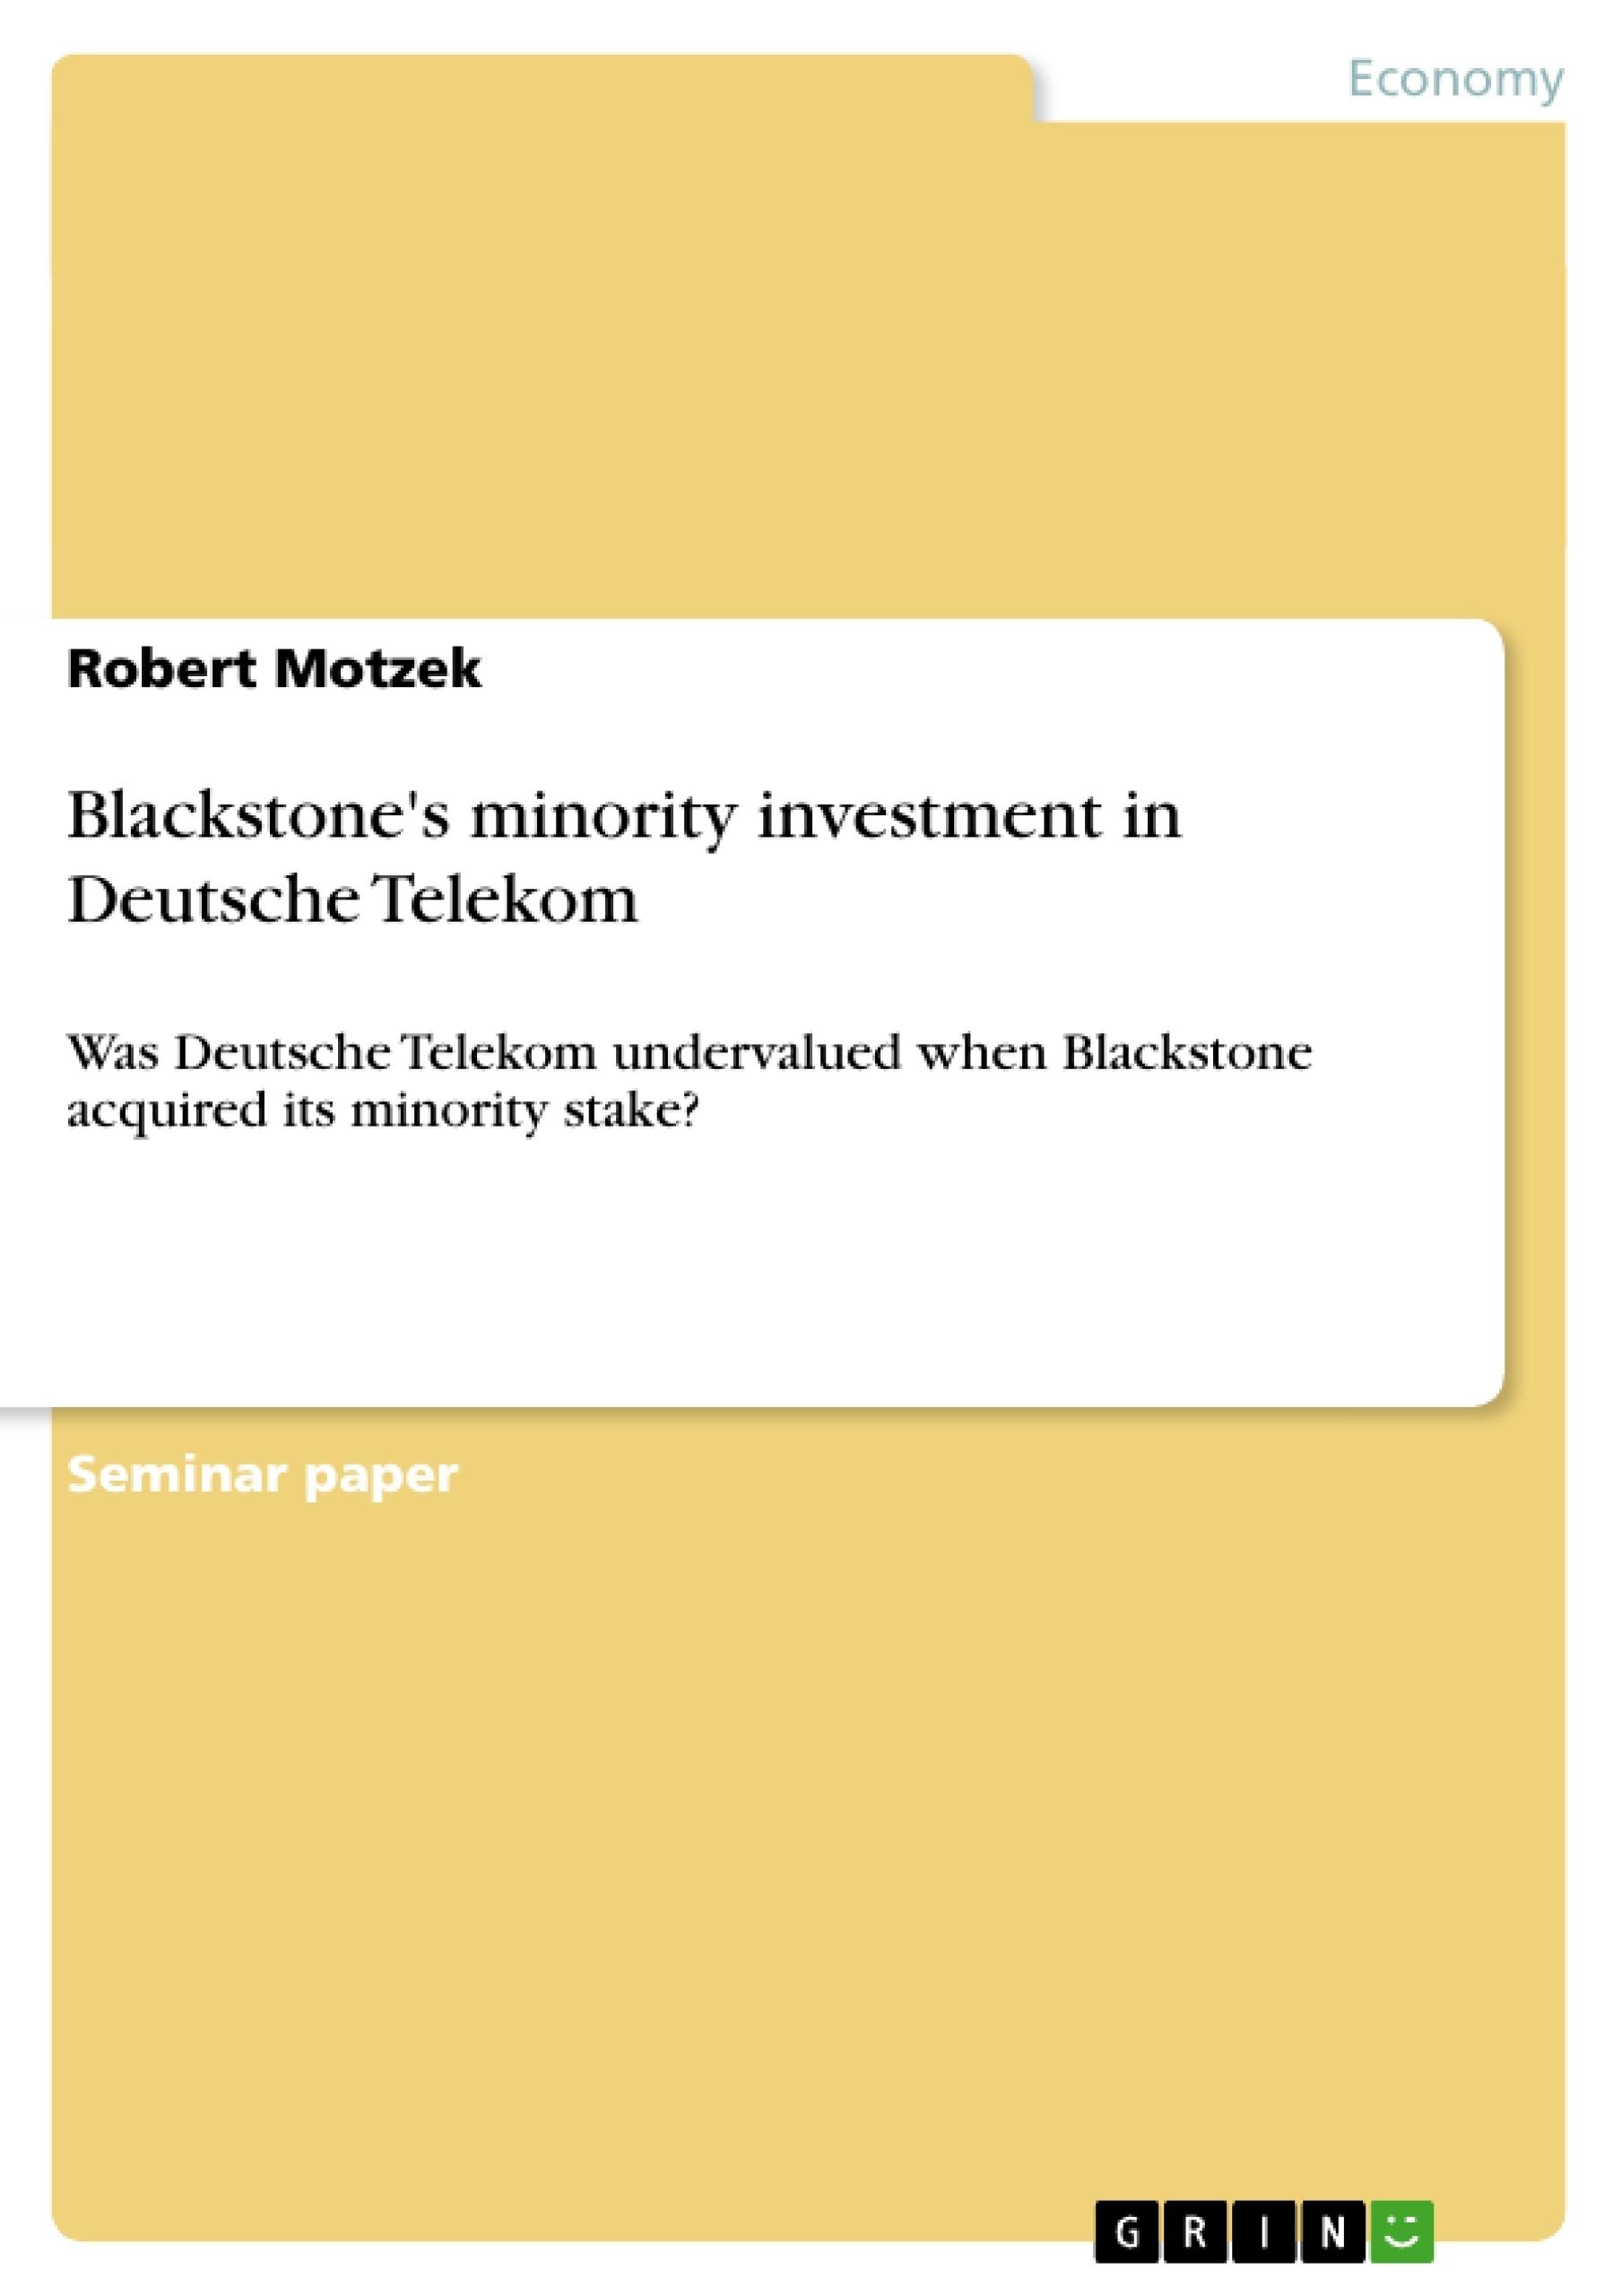 Title: Blackstone's minority investment in Deutsche Telekom